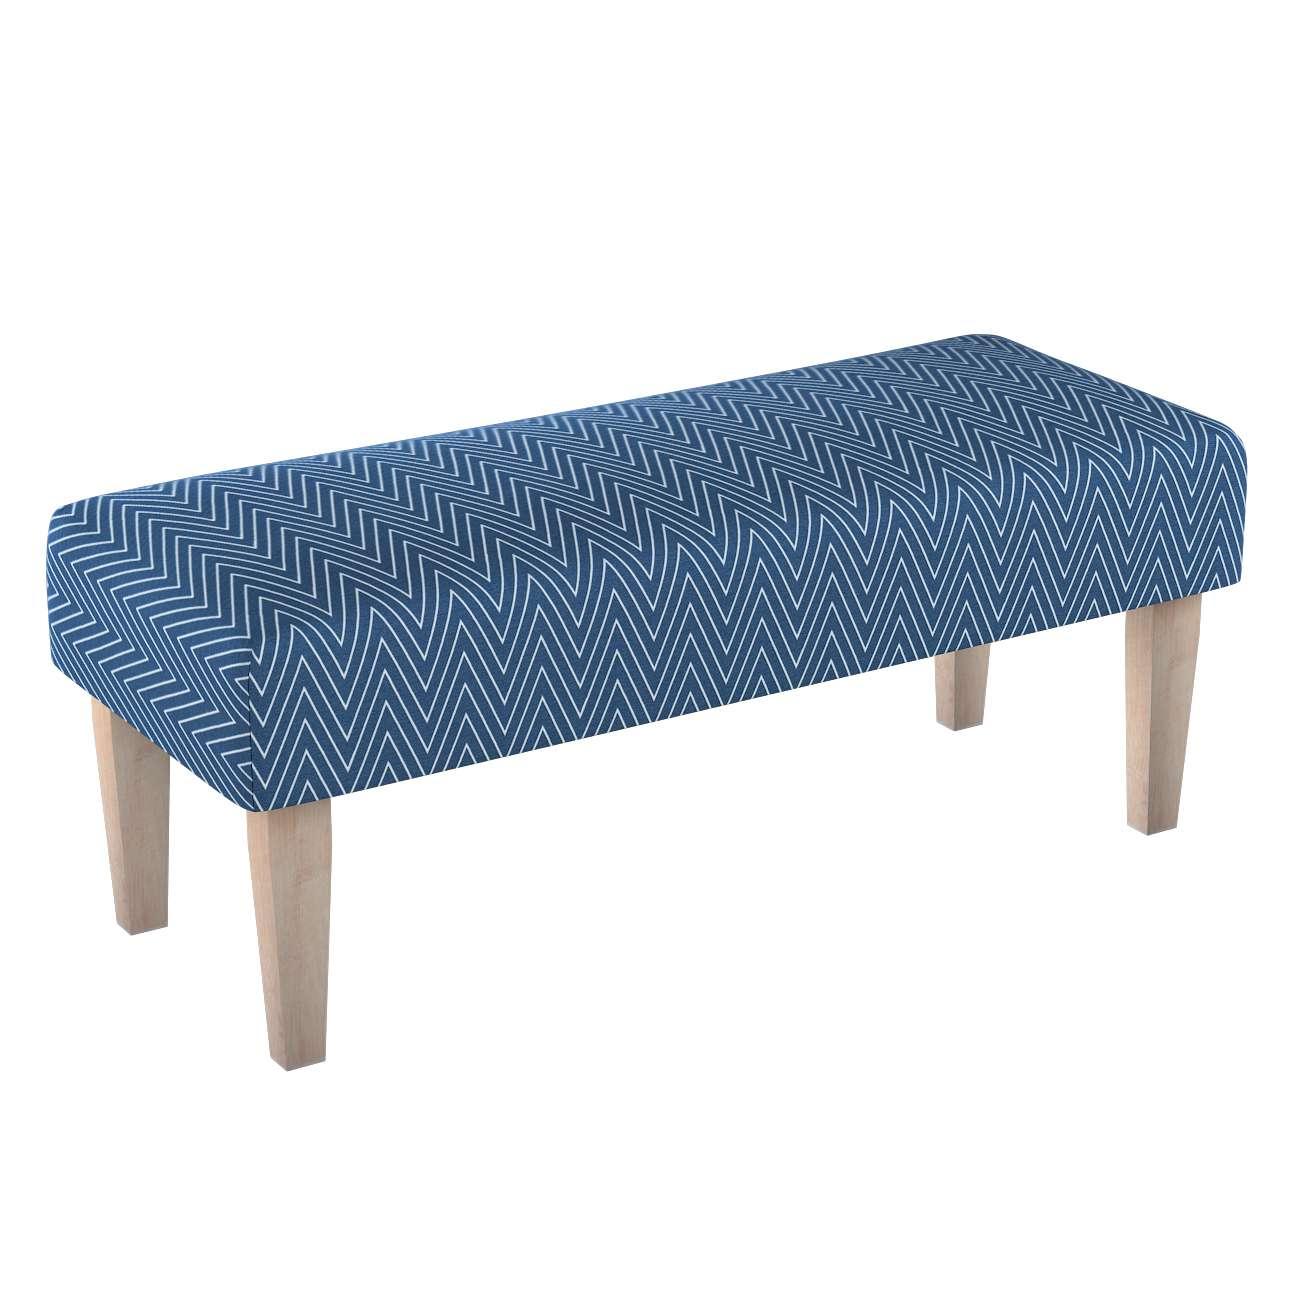 Dlouhá lavička 100x40cm s volbou látky